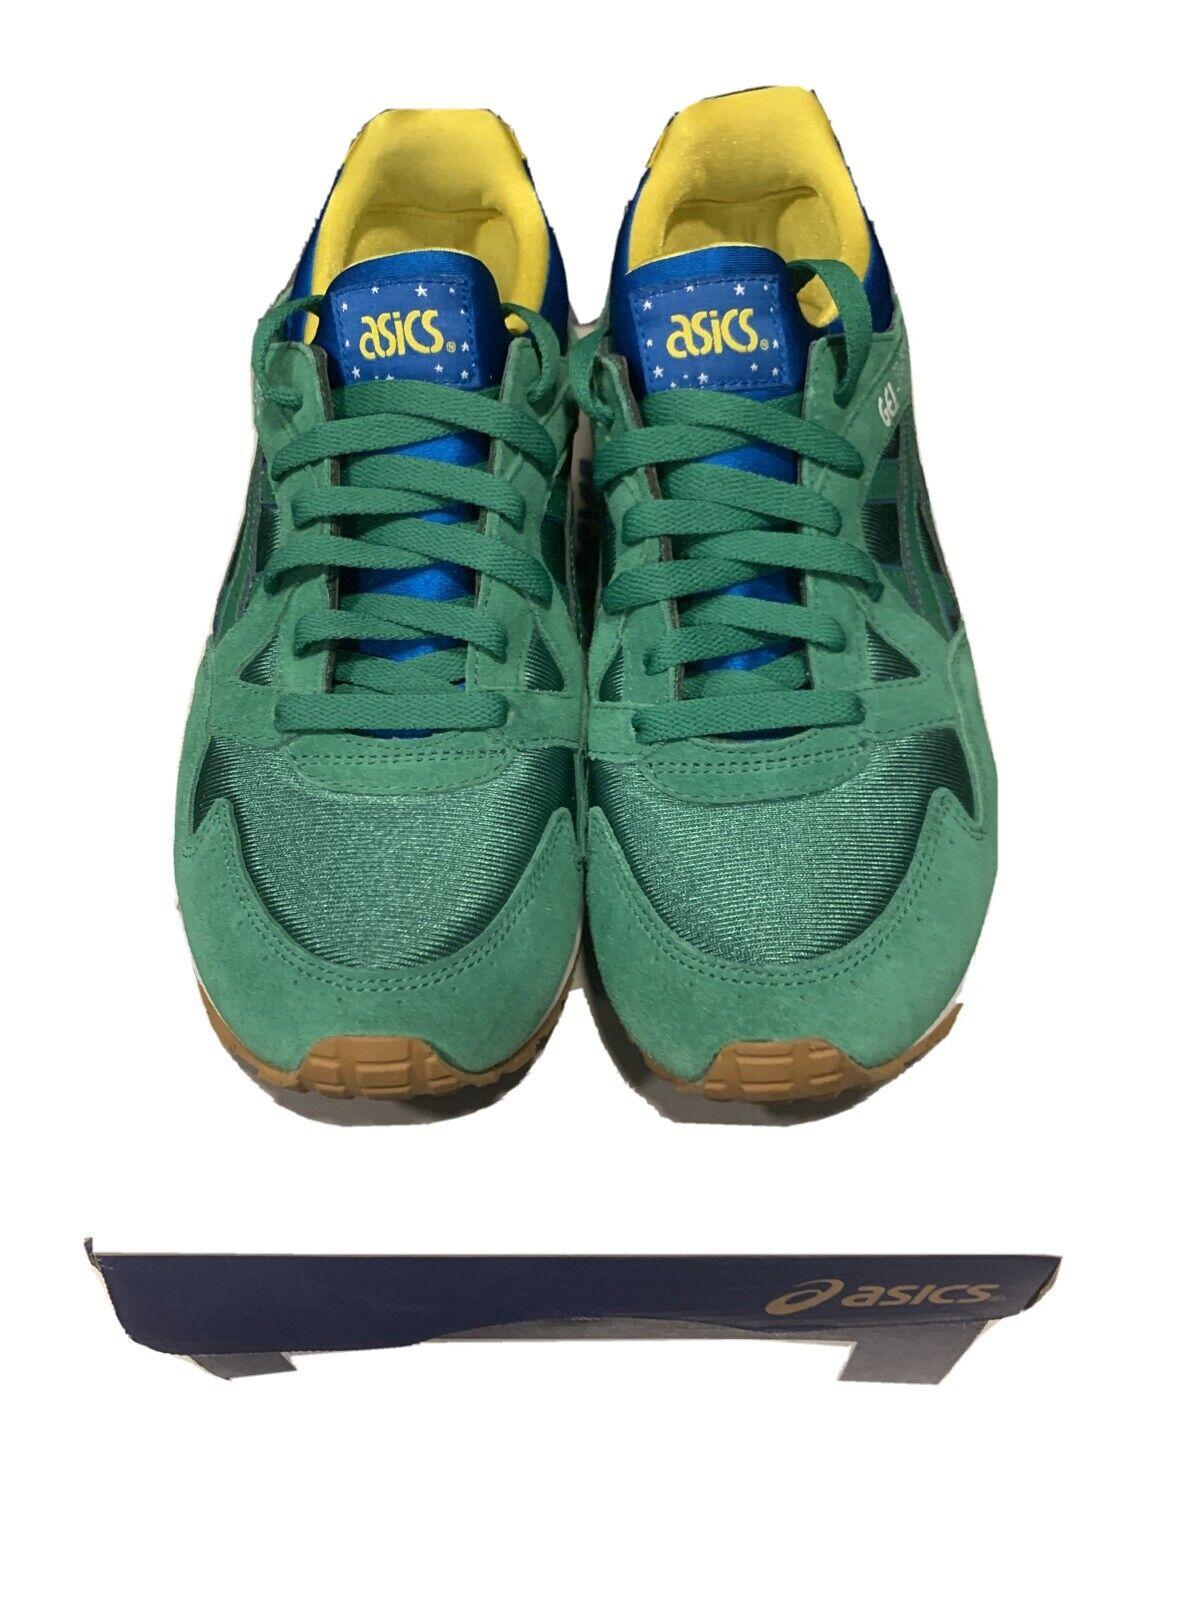 Por qué no igual jugo  asics Gel-Lyte V Brazil Pack Shoes Trainers Blue H6R1N 4242 for ...